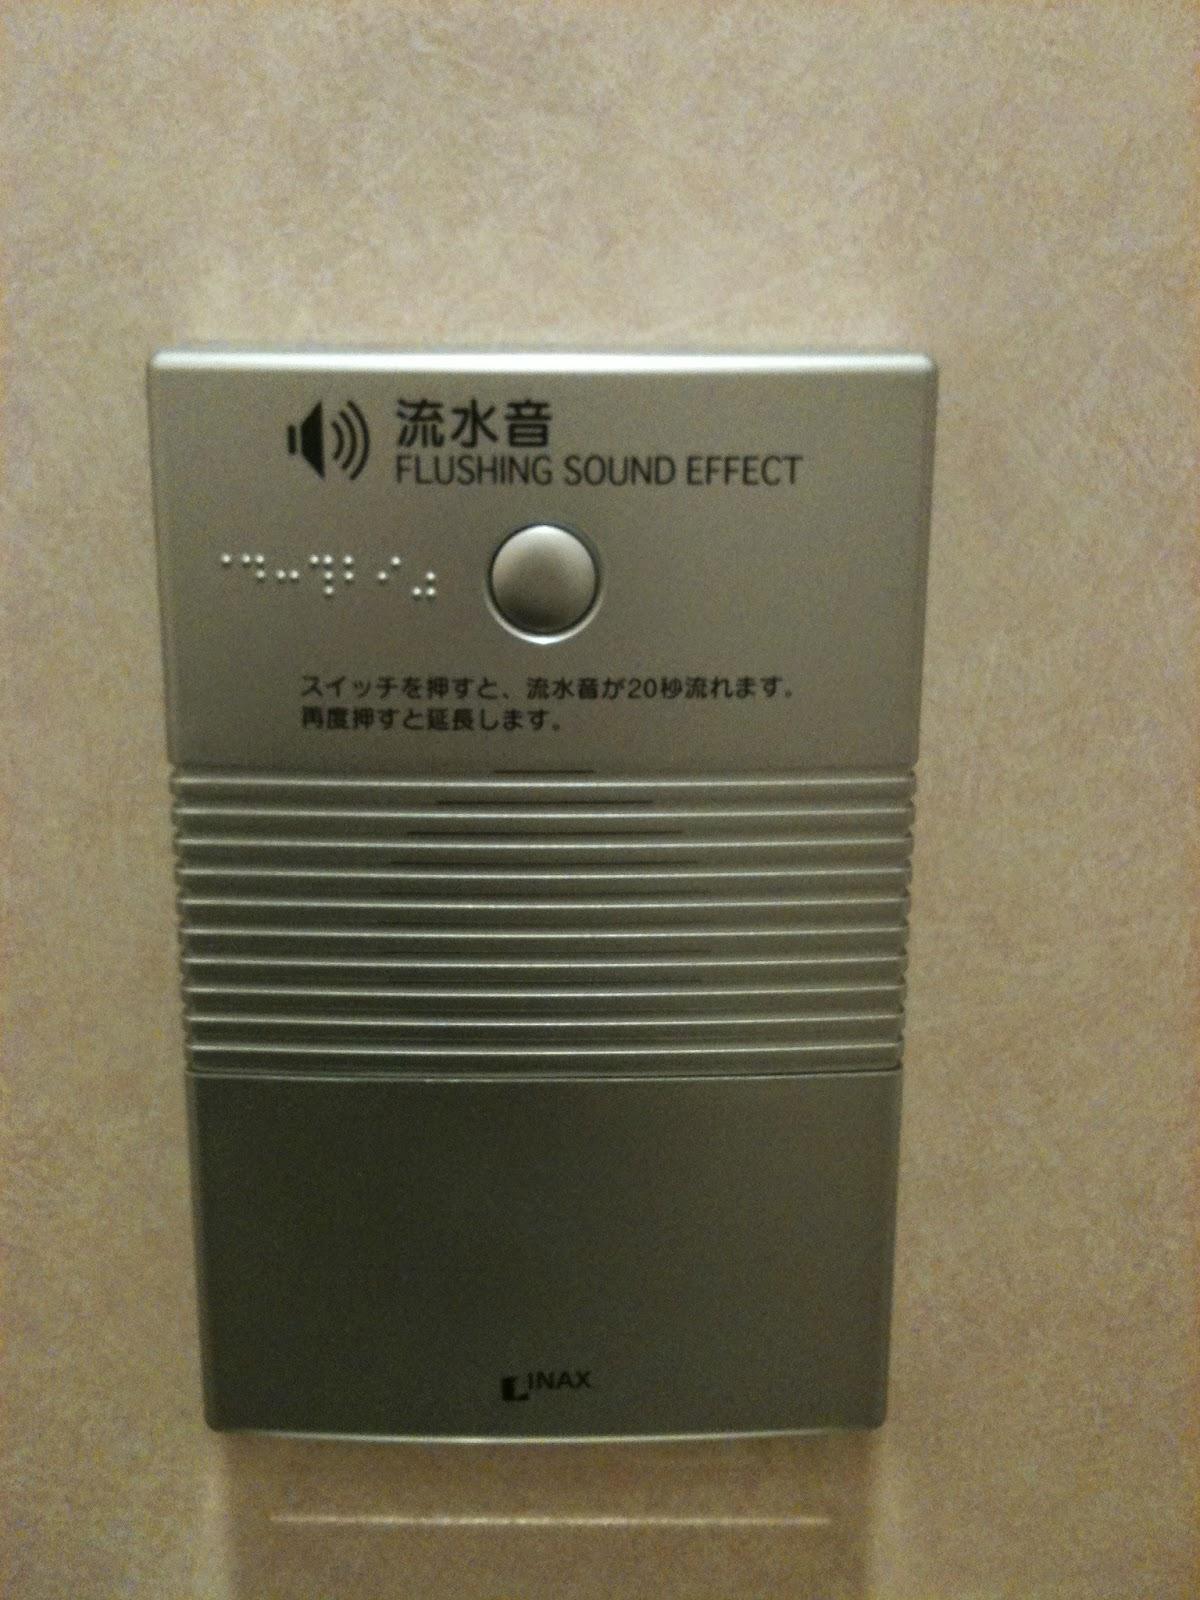 Tokyo - Toilet gadget found in the Kokugikan Sumo Stadium